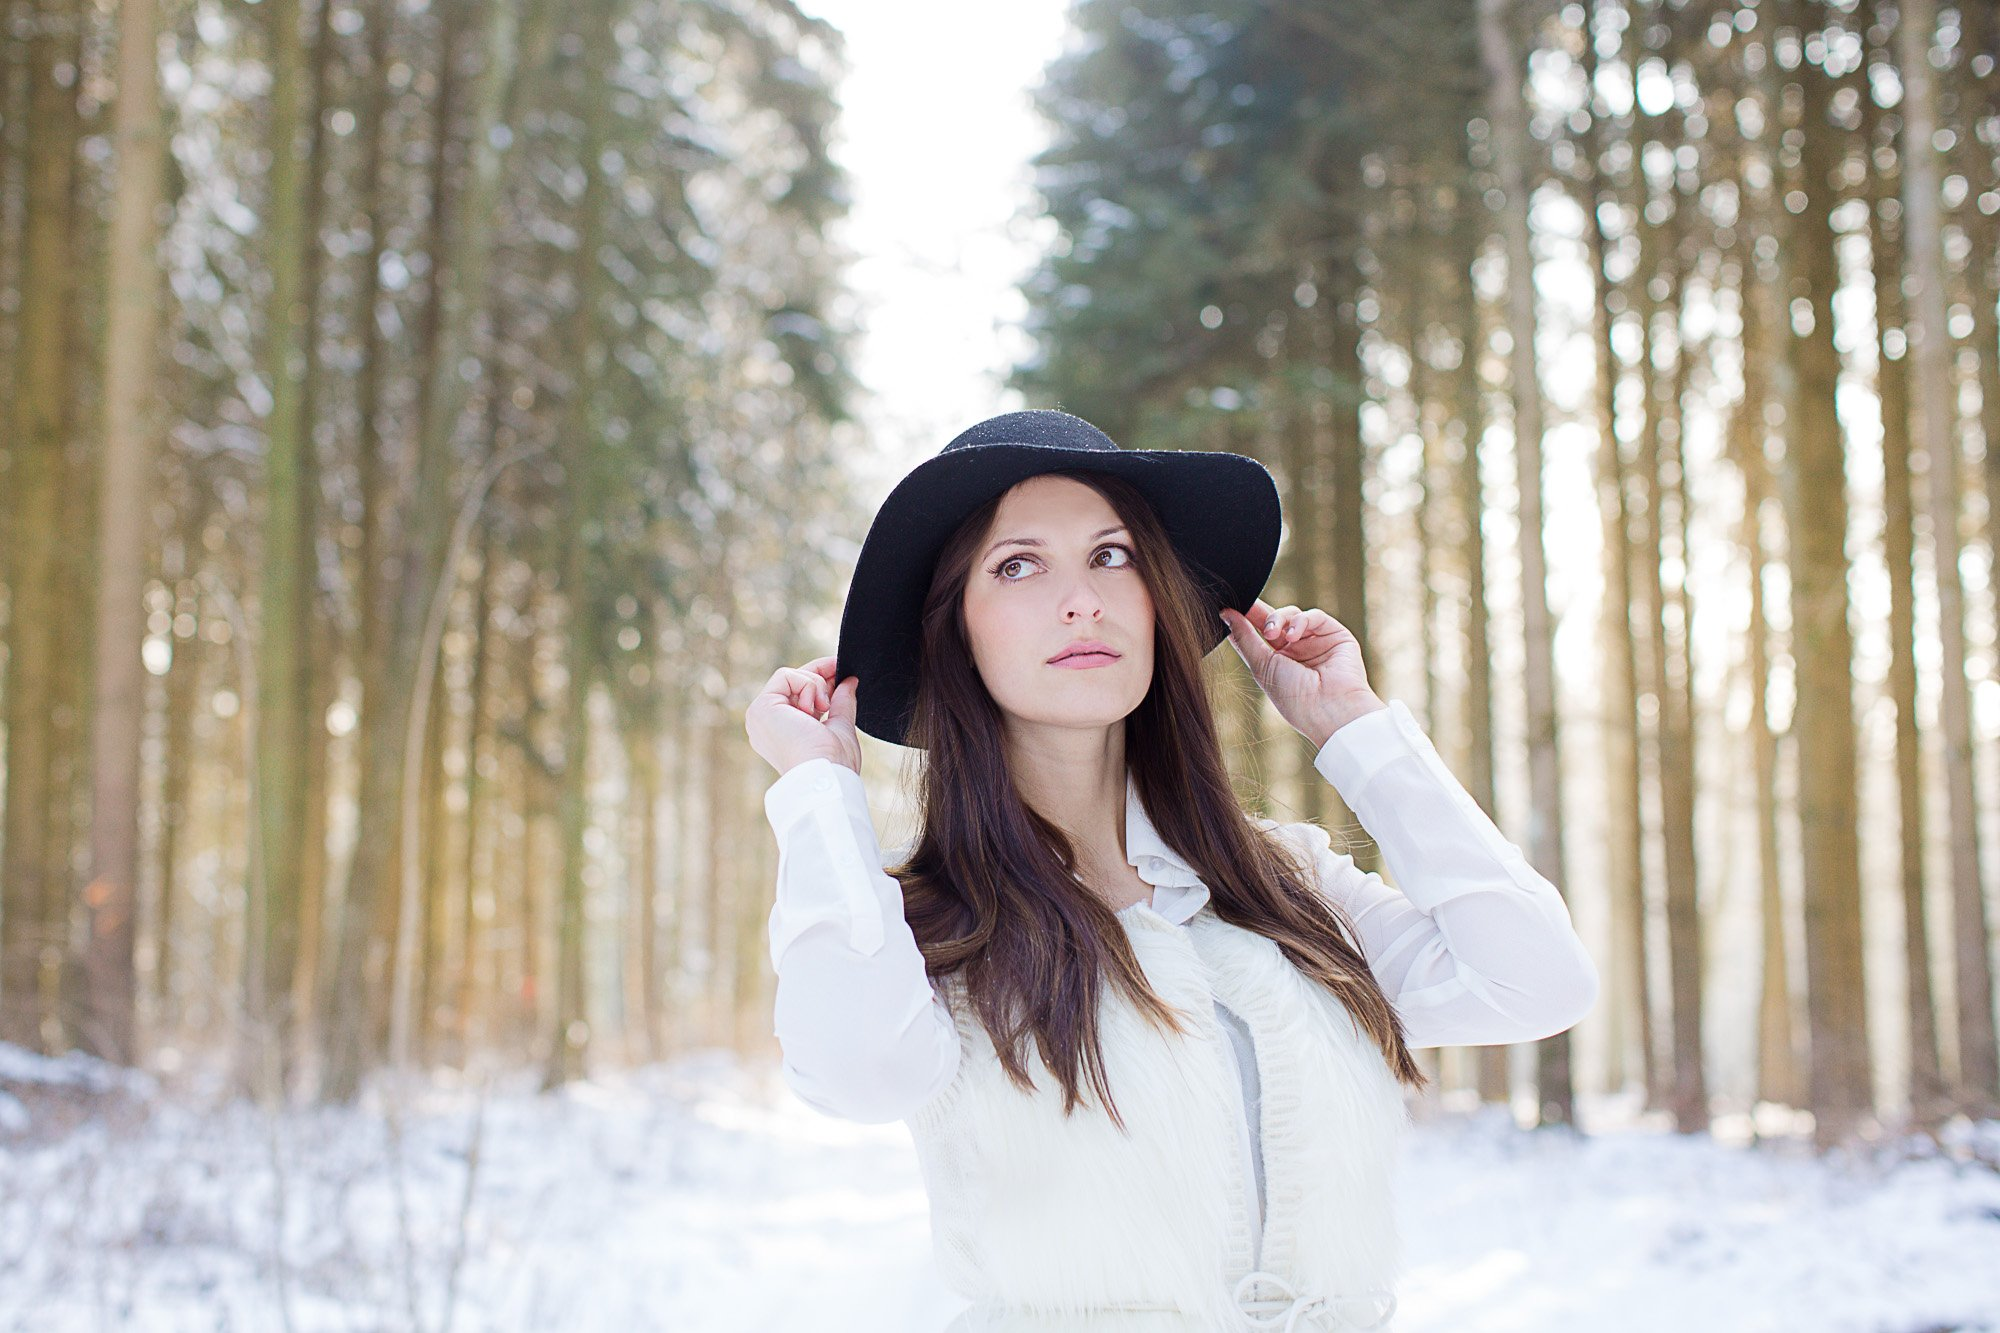 Winter Fotoshooting in Heideheim